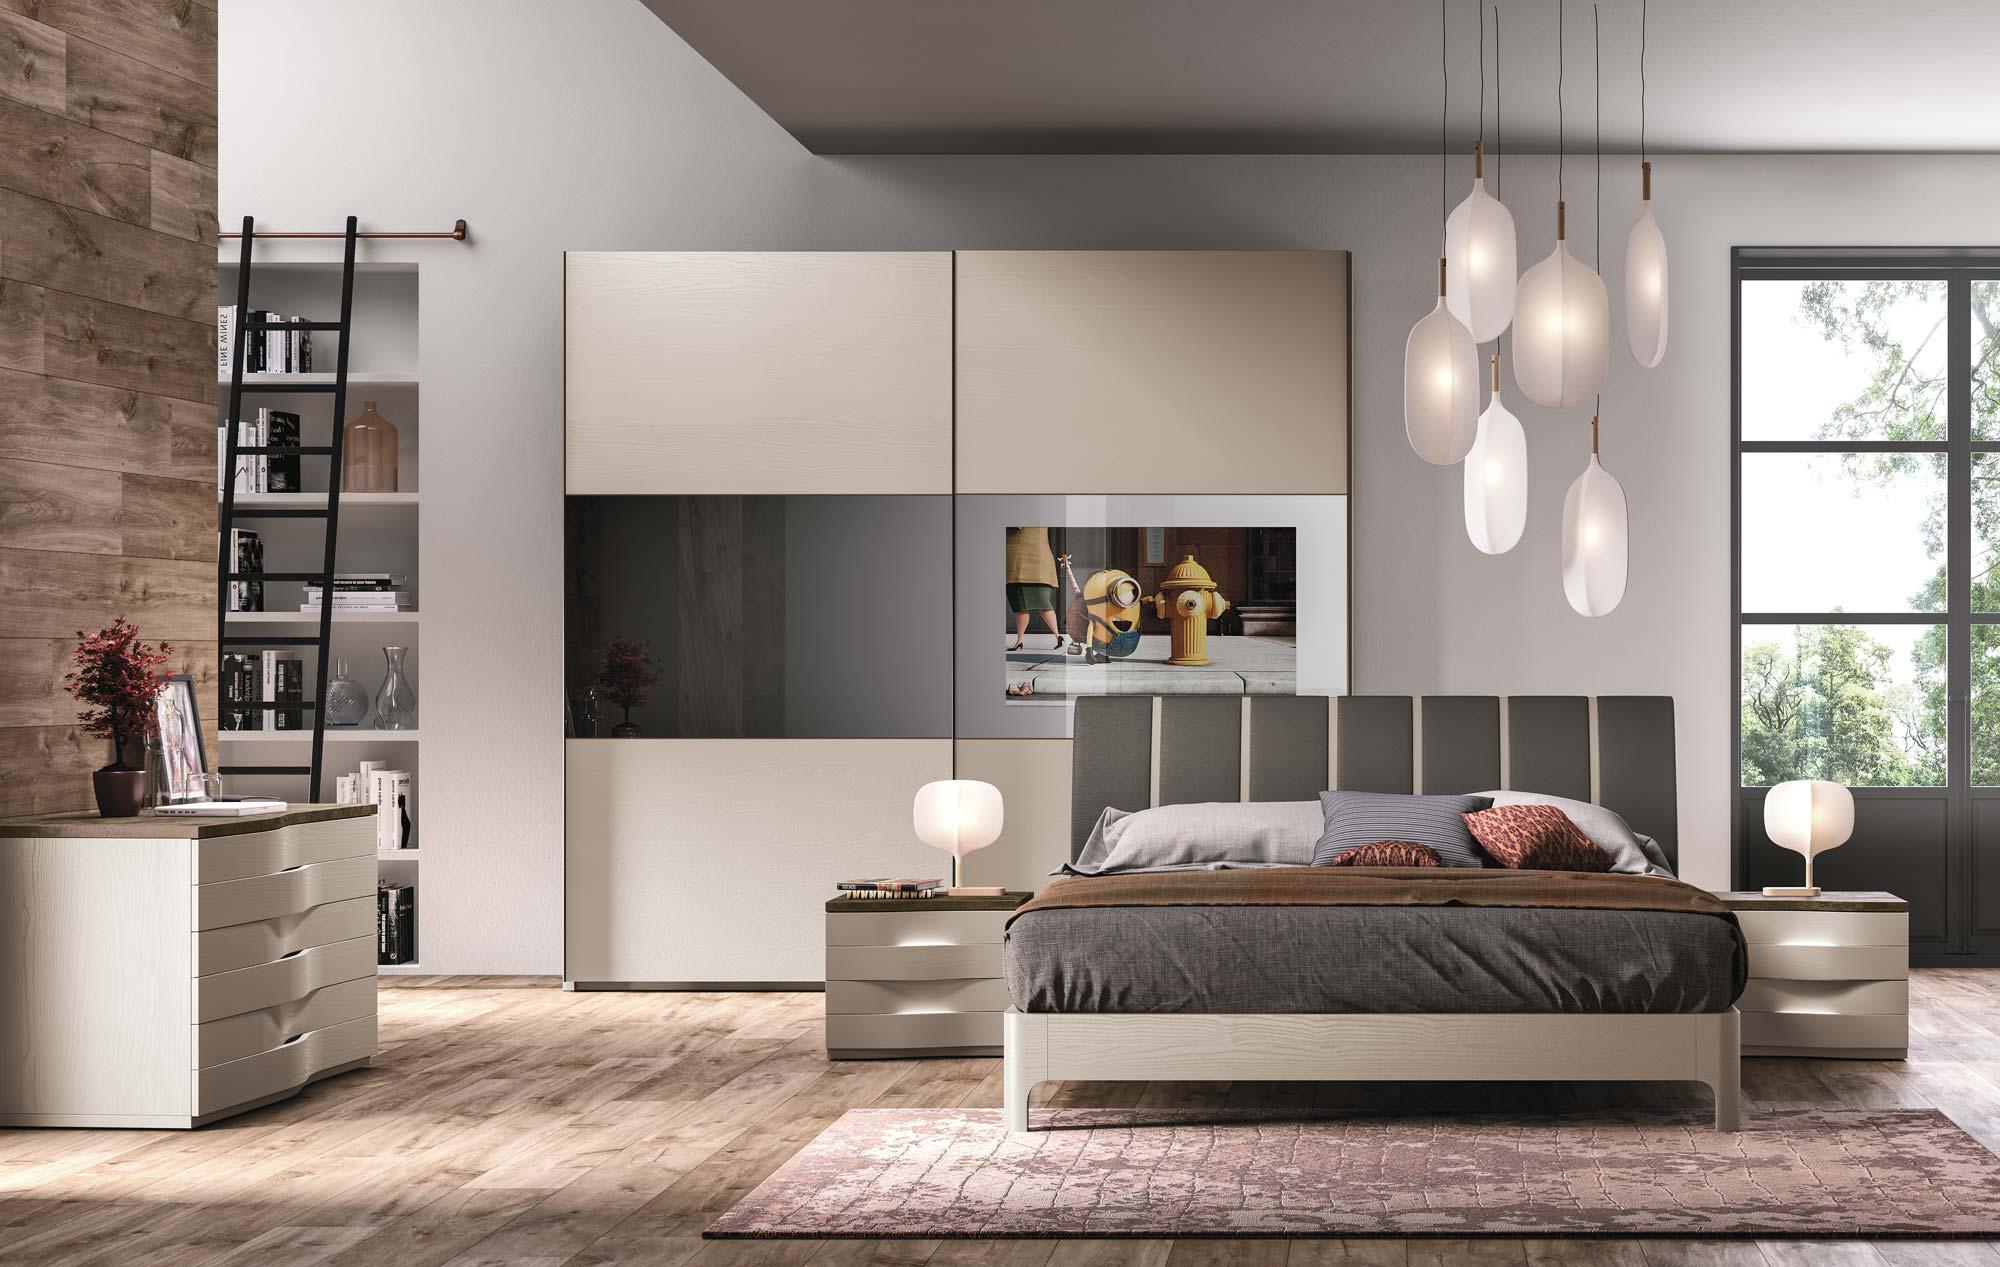 Novit 2018 materya 2 smart tv for Camere da letto famose